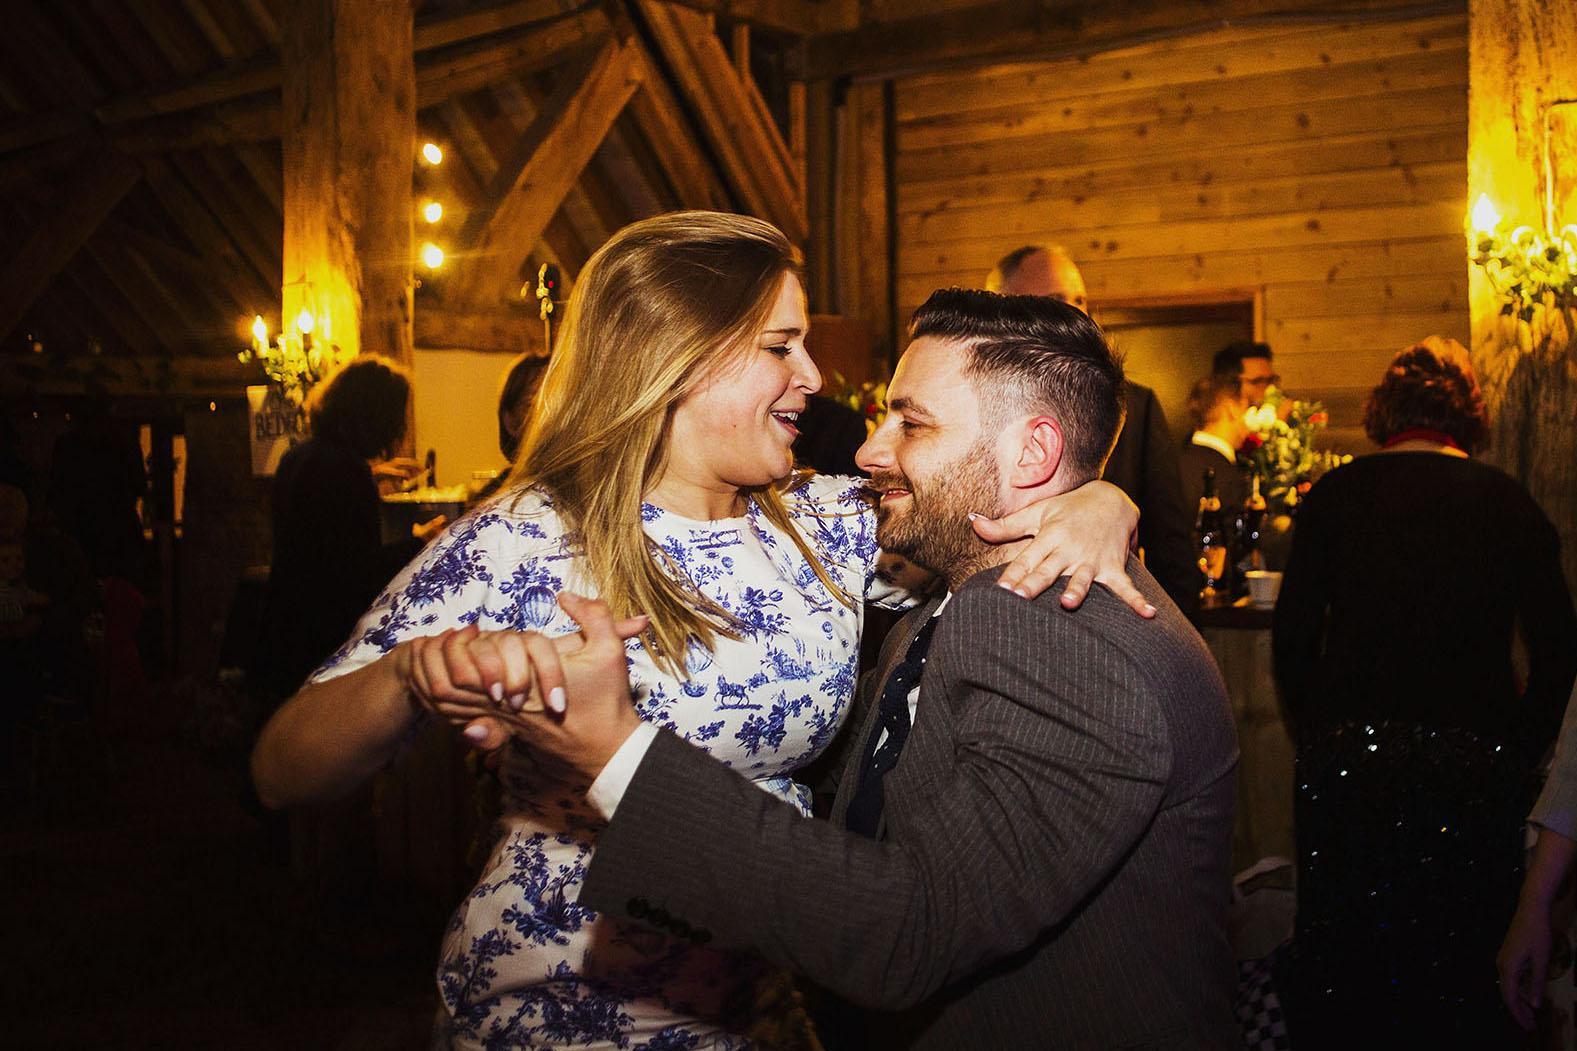 wedding guests dancing at wedding reception at barford park wedding venue in wiltshire